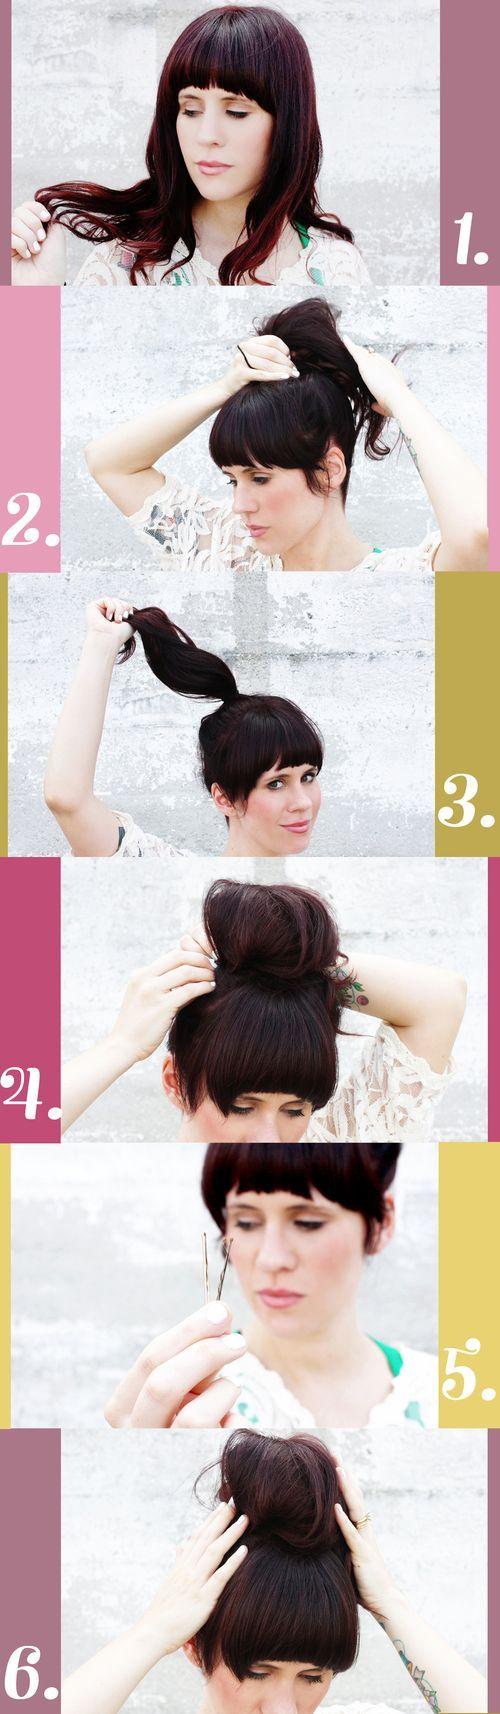 best hairapalooza images on pinterest make up looks hair